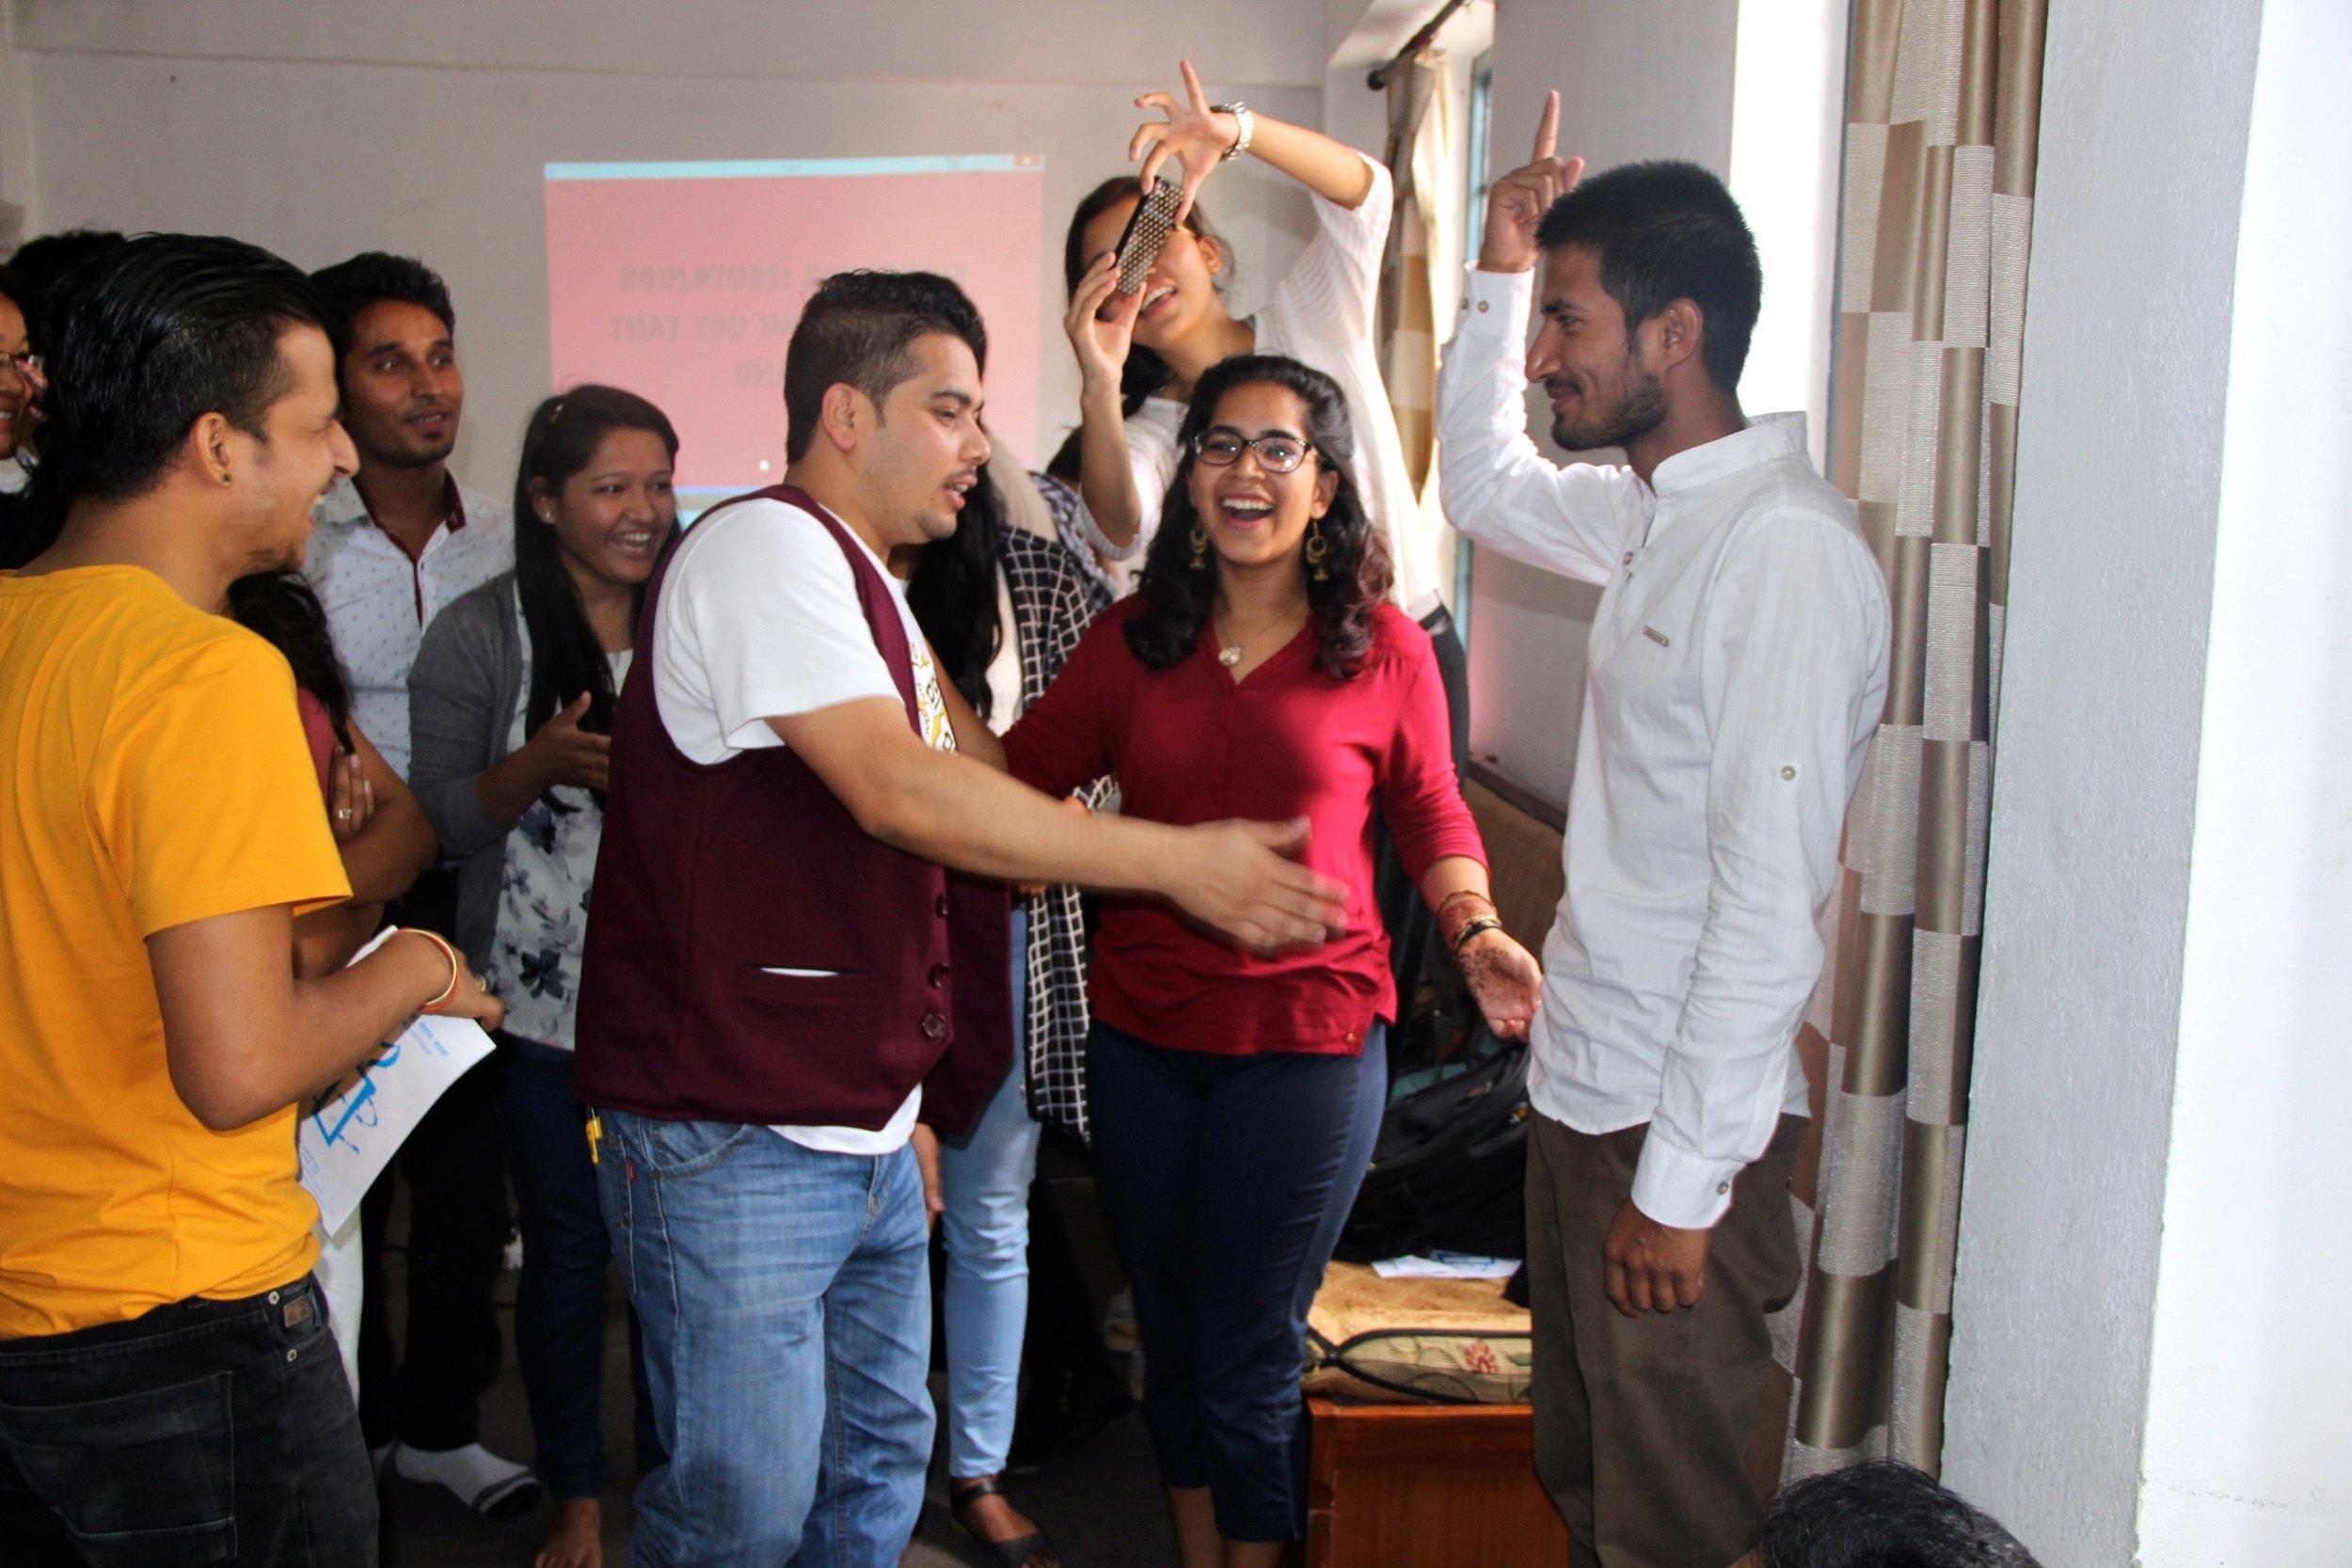 Workshop on Creative Resistance at Teach-in for Radical Hope, December 2016.